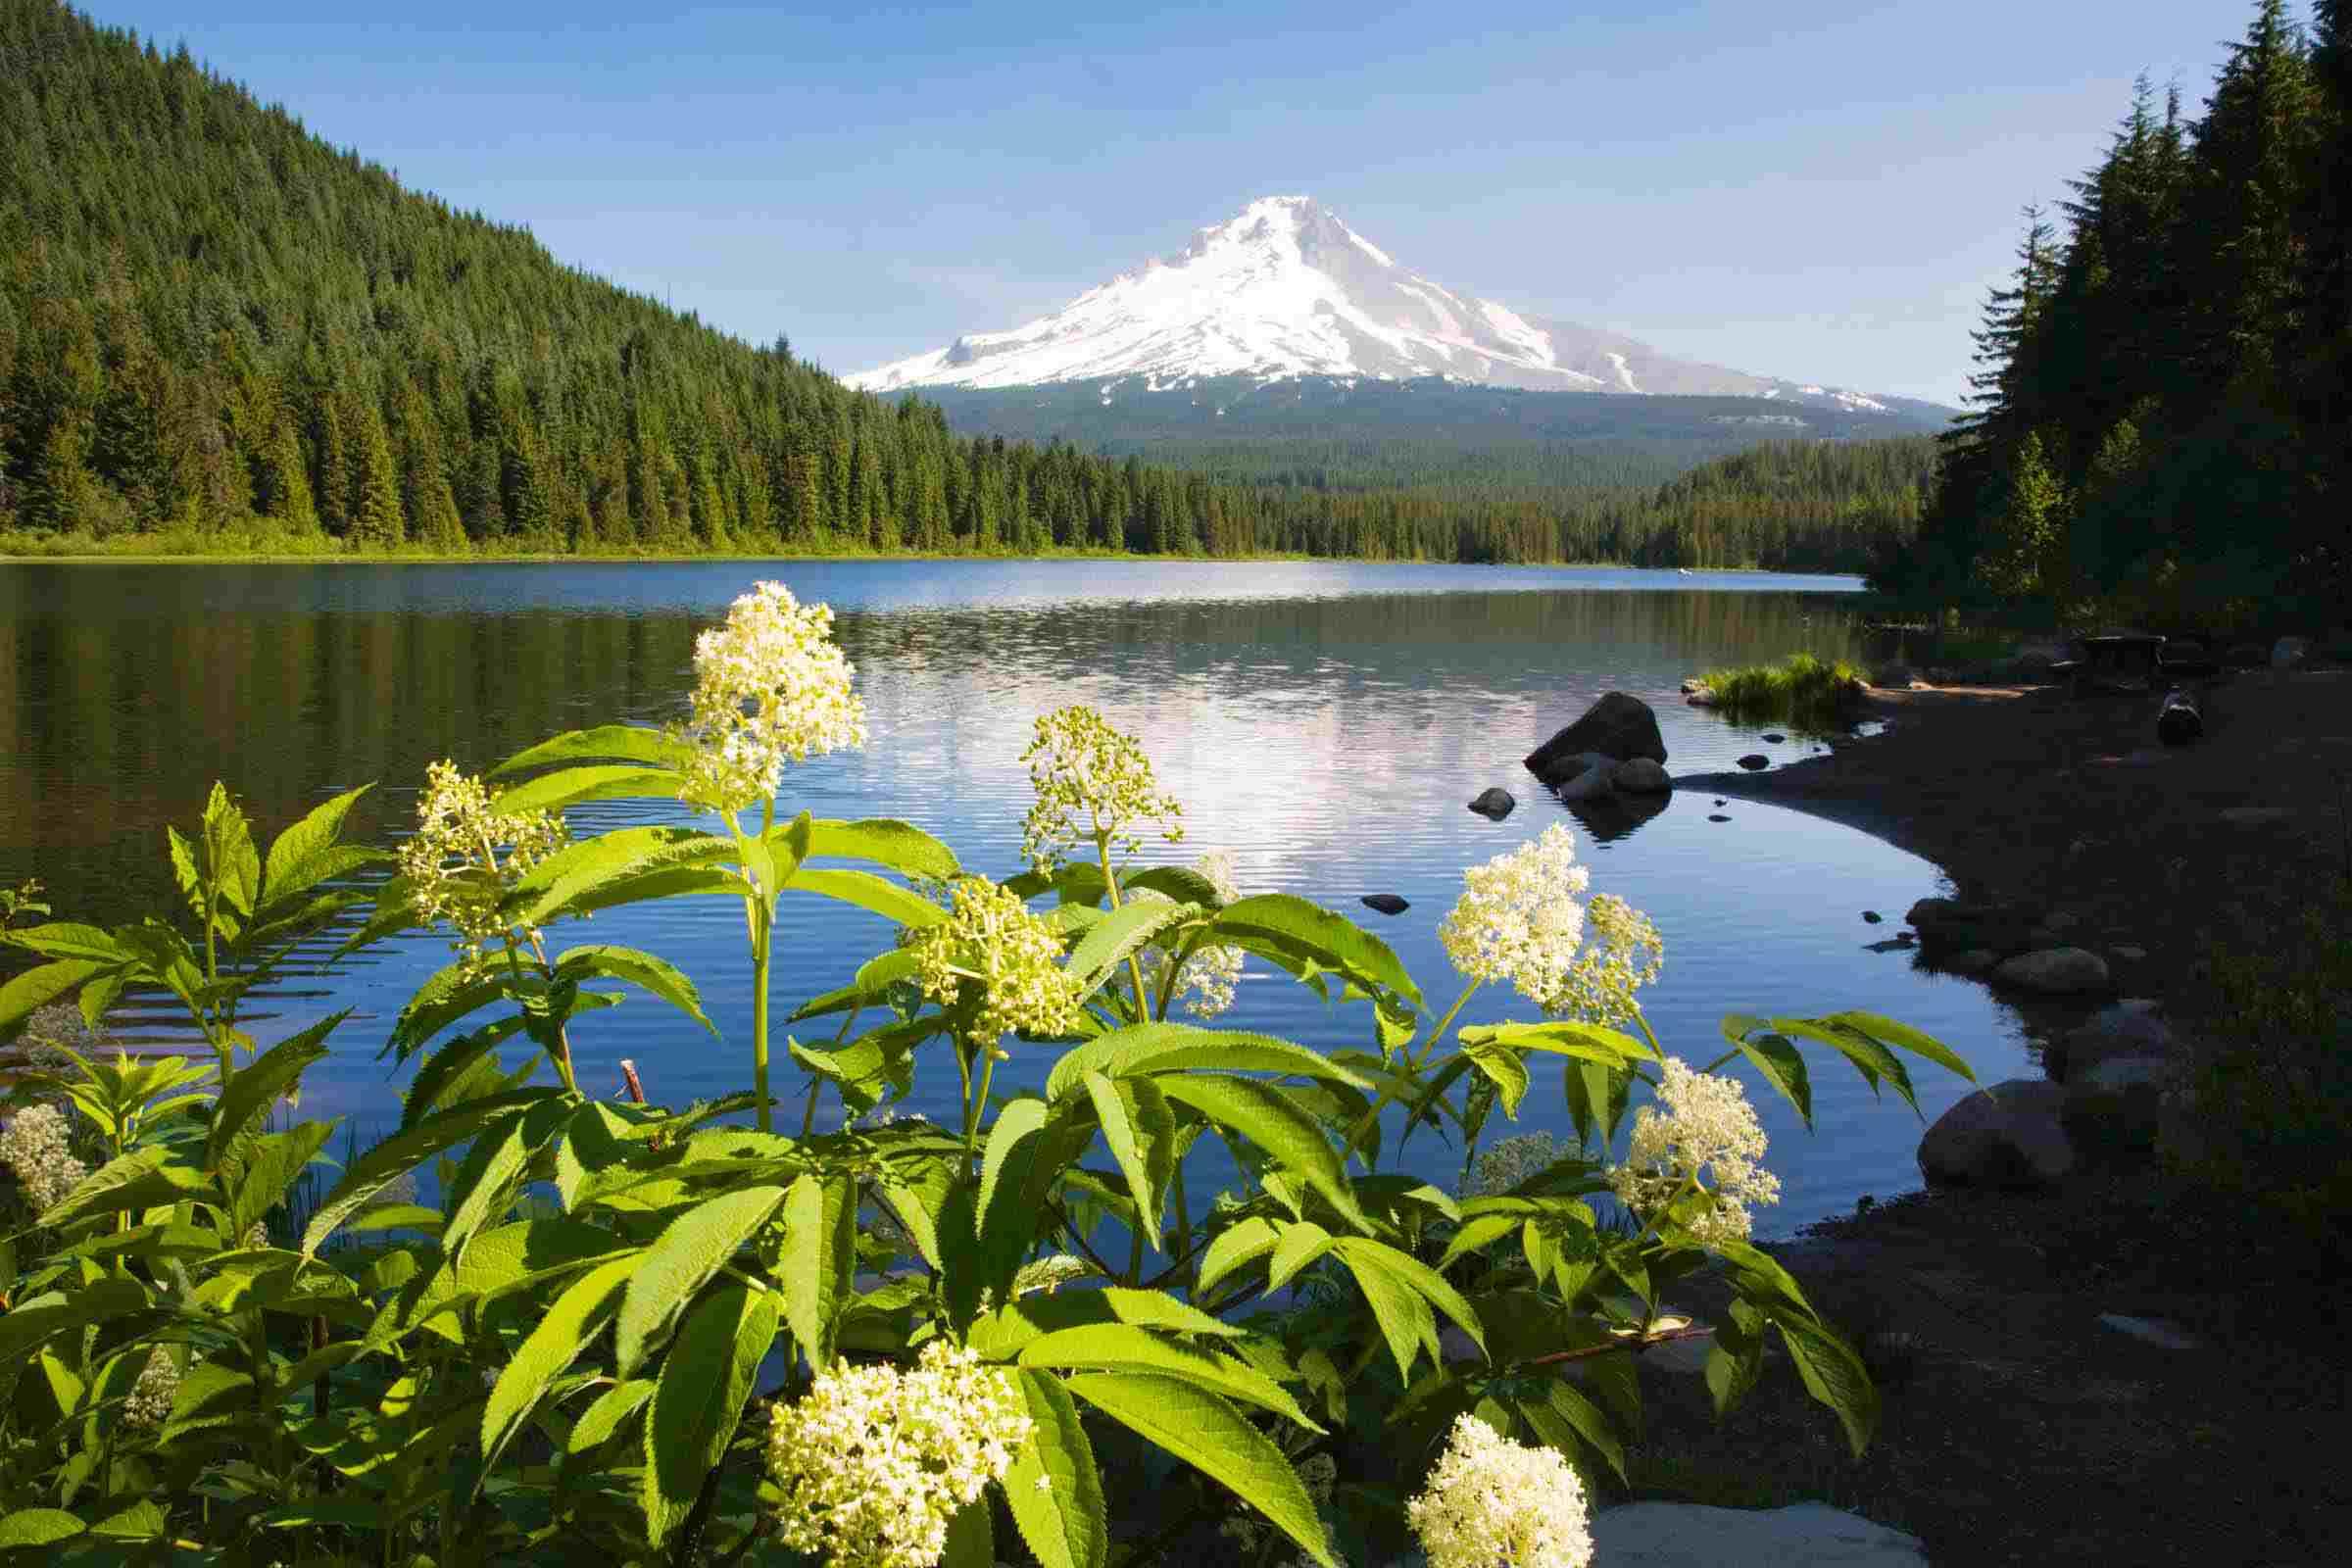 Mount Hood National Forest in Oregon